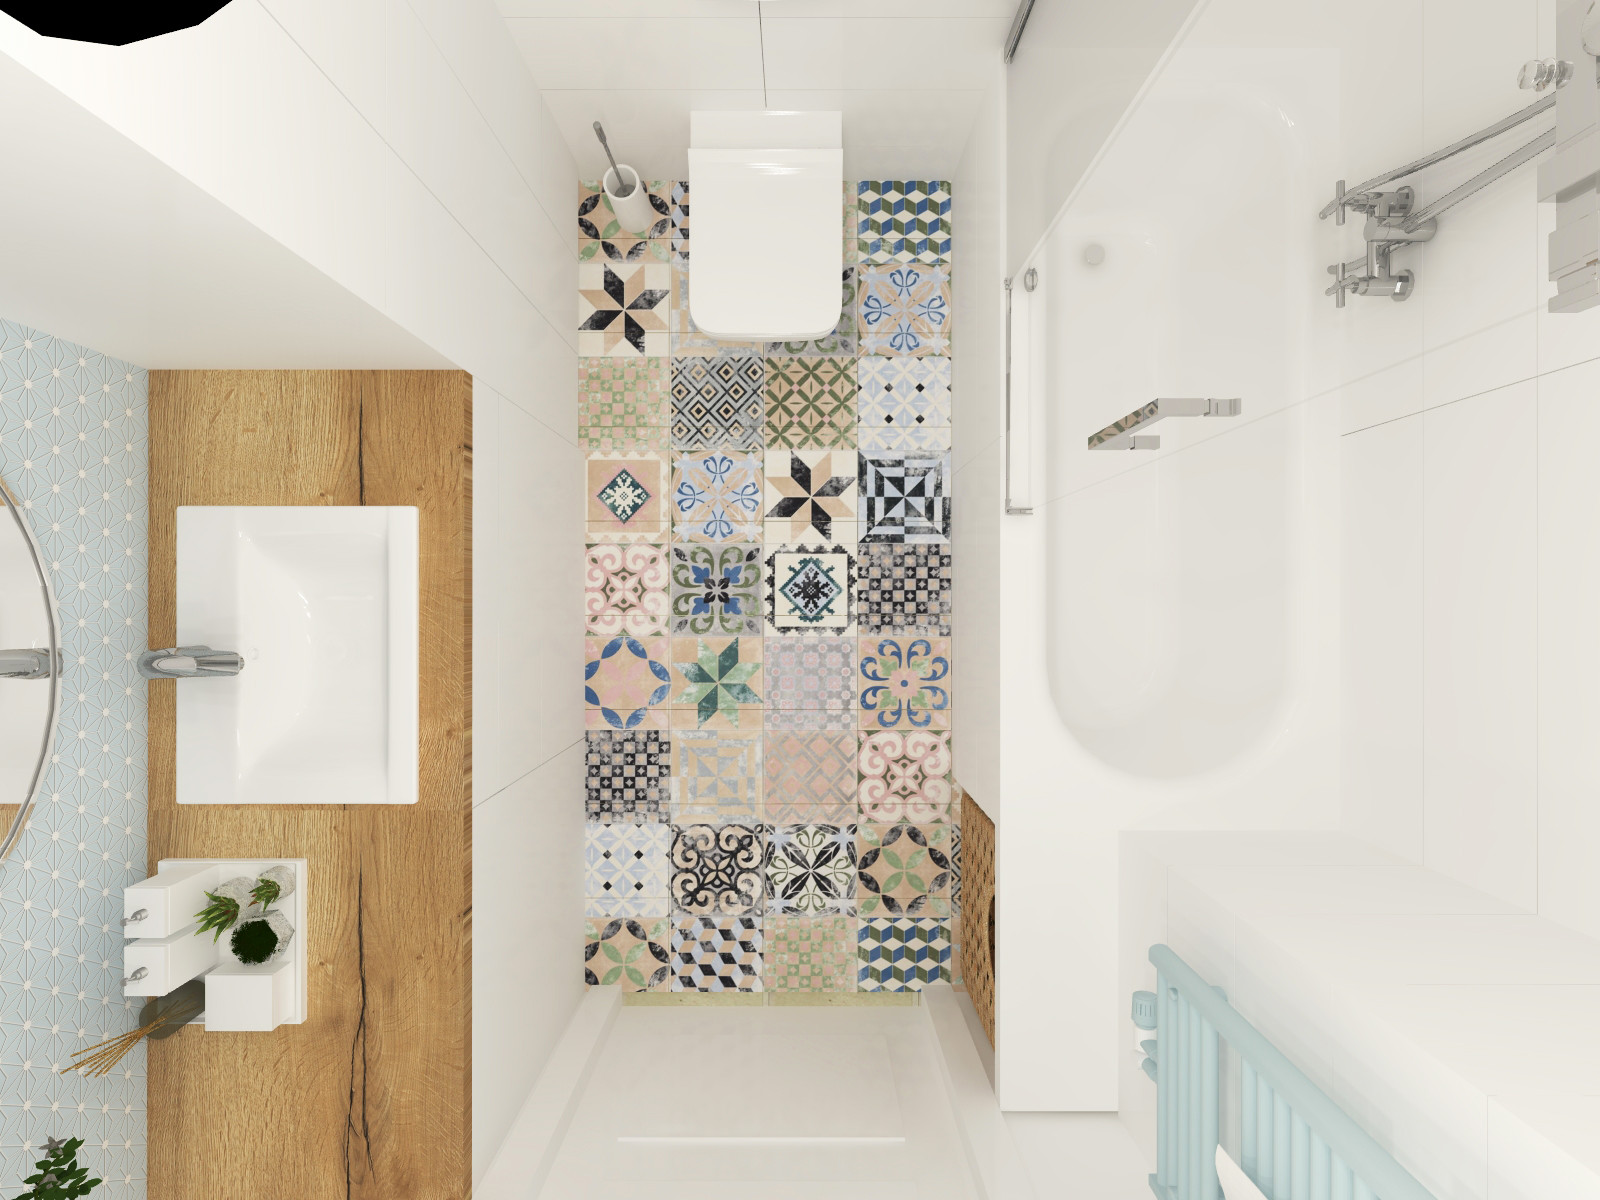 łazienka Biel Z Nutą Boho I Błękitu Anntresola